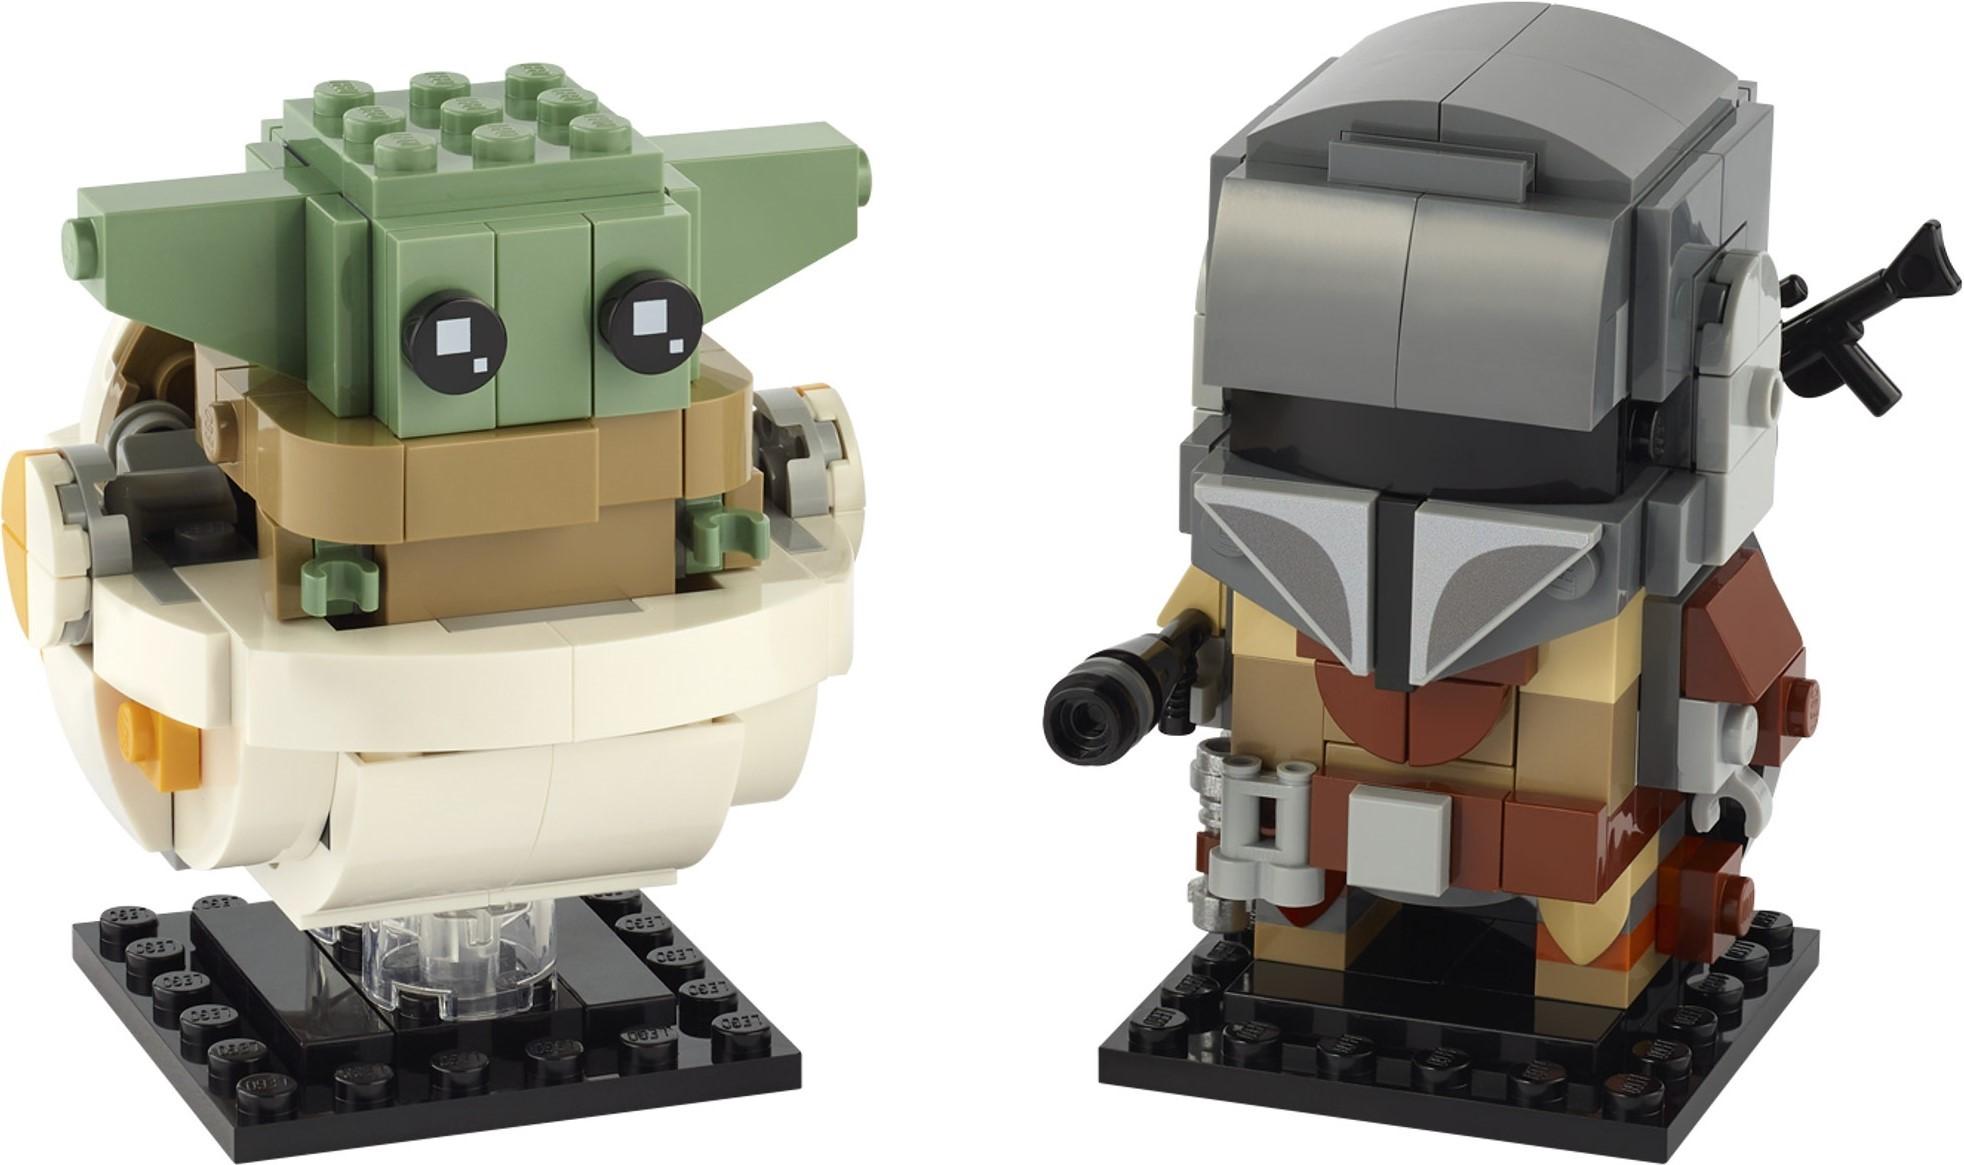 NEW Baby Yoda The Mandalorian Star Wars Lego Moc Minifigure